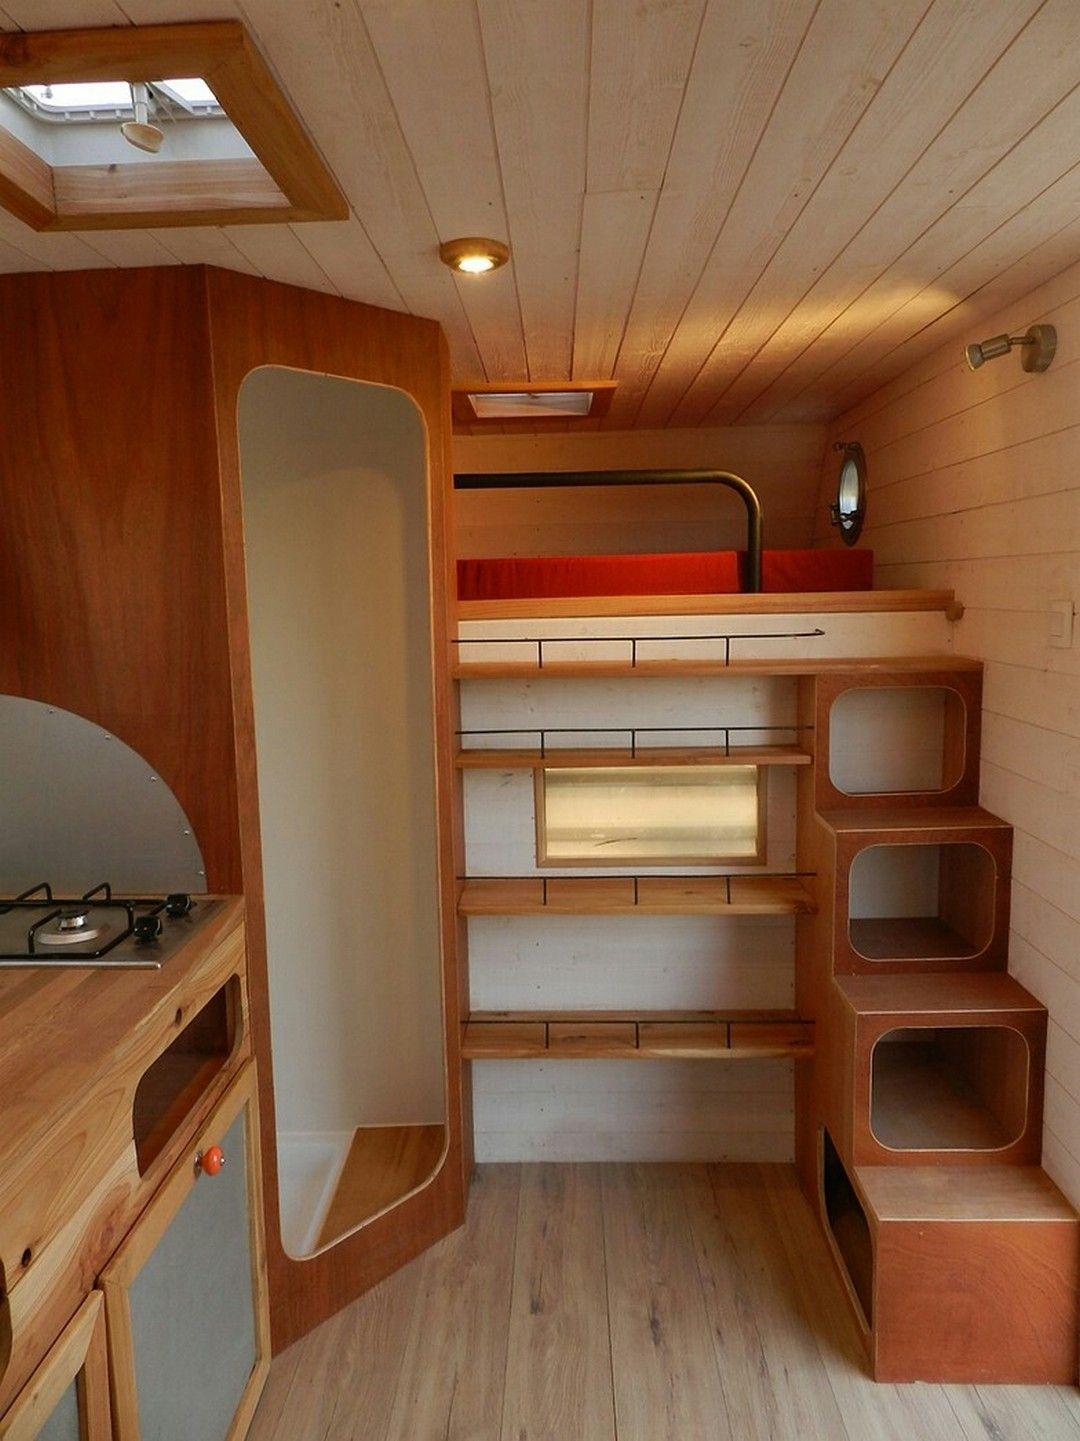 50 cool and fresh ideas van life interior design | tiny sweet home